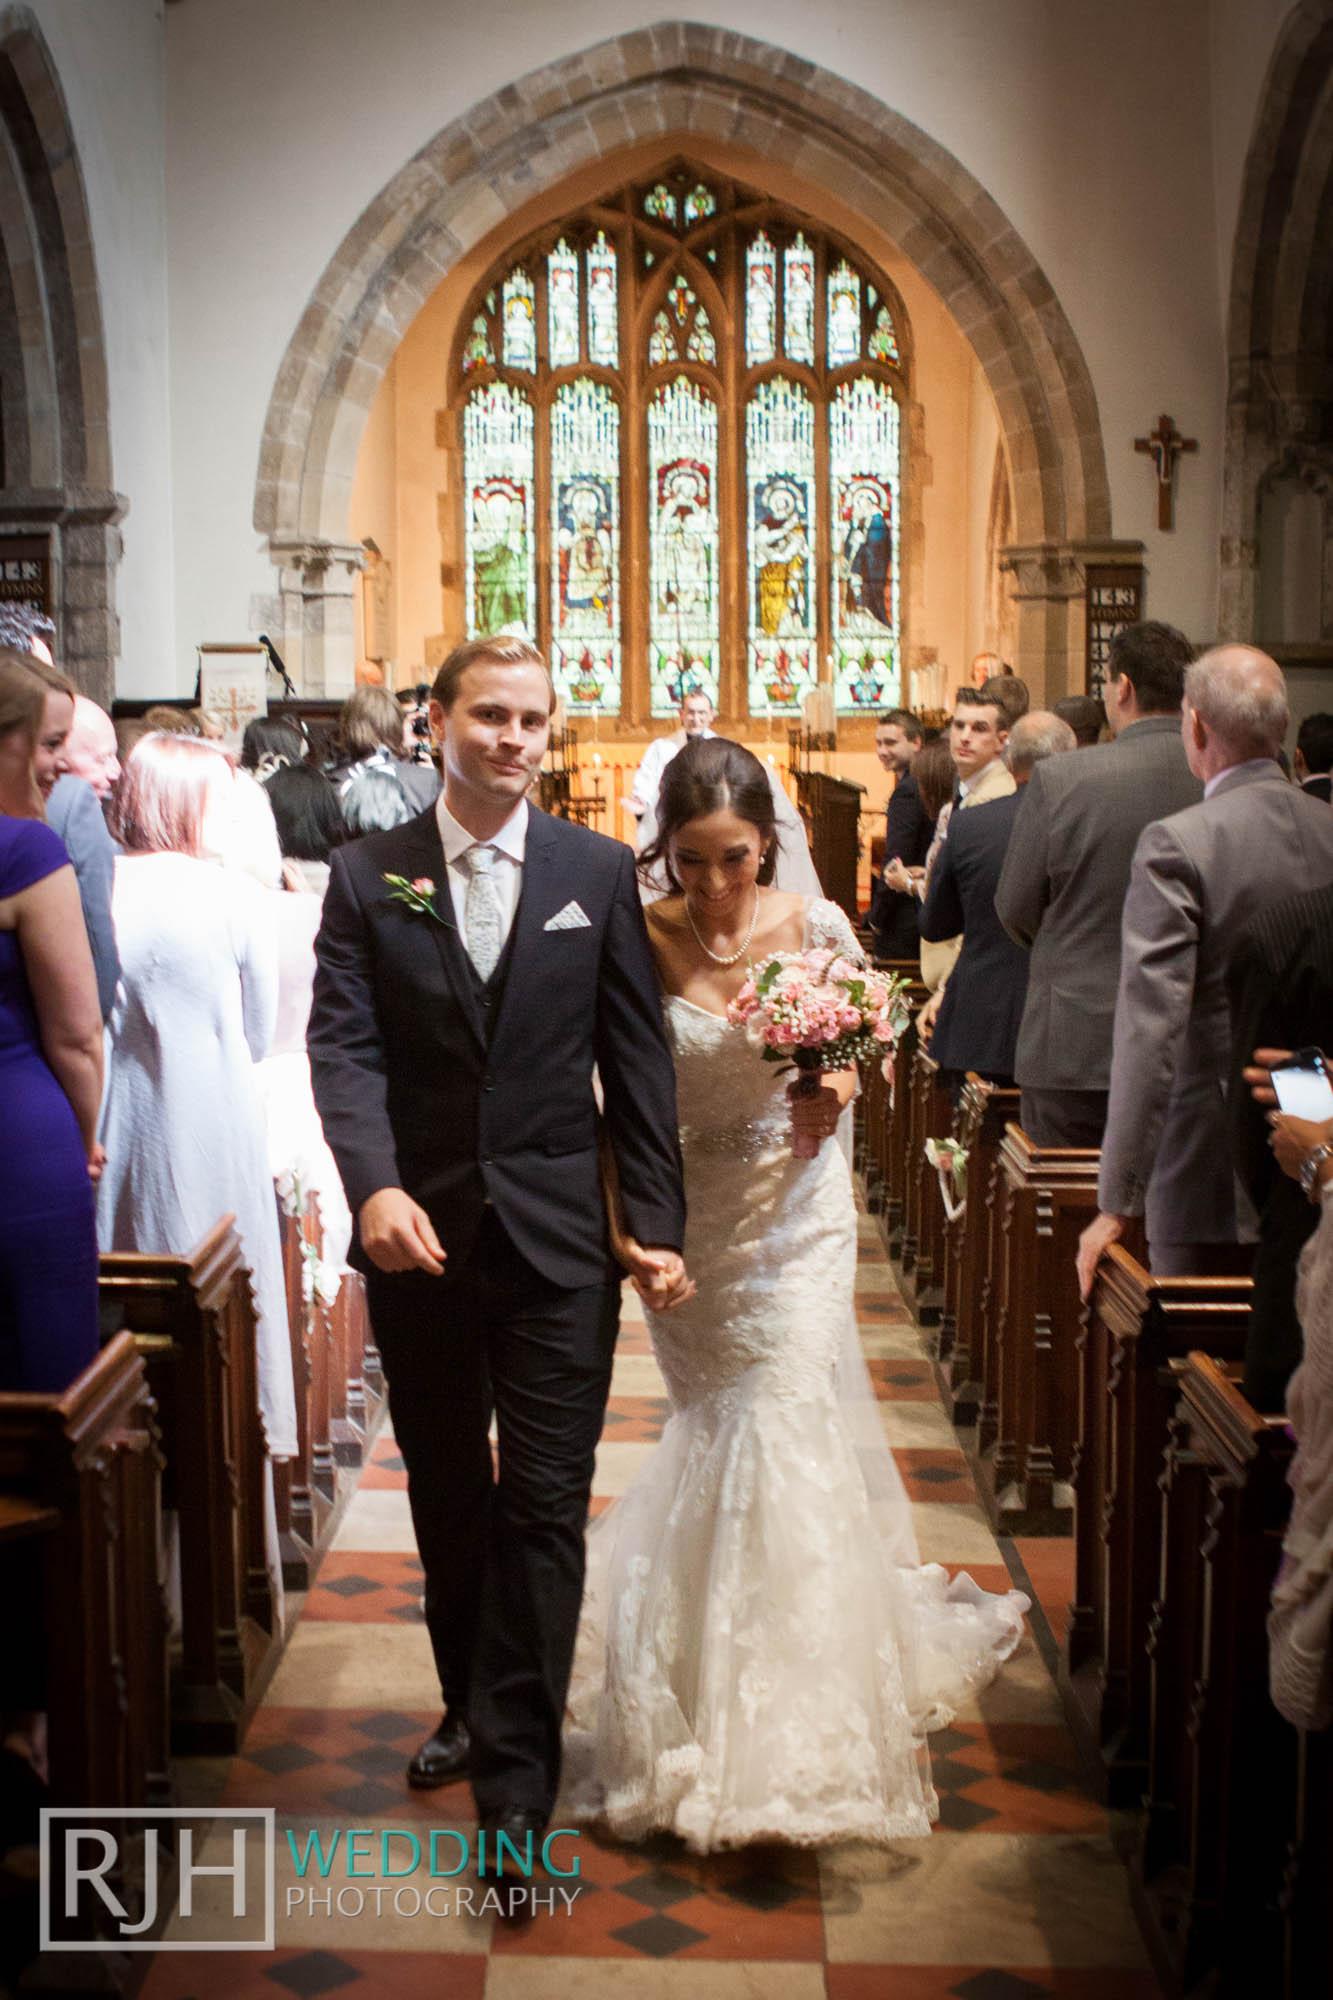 RJH Wedding Photography_Tankersley Manor Wedding_26.jpg